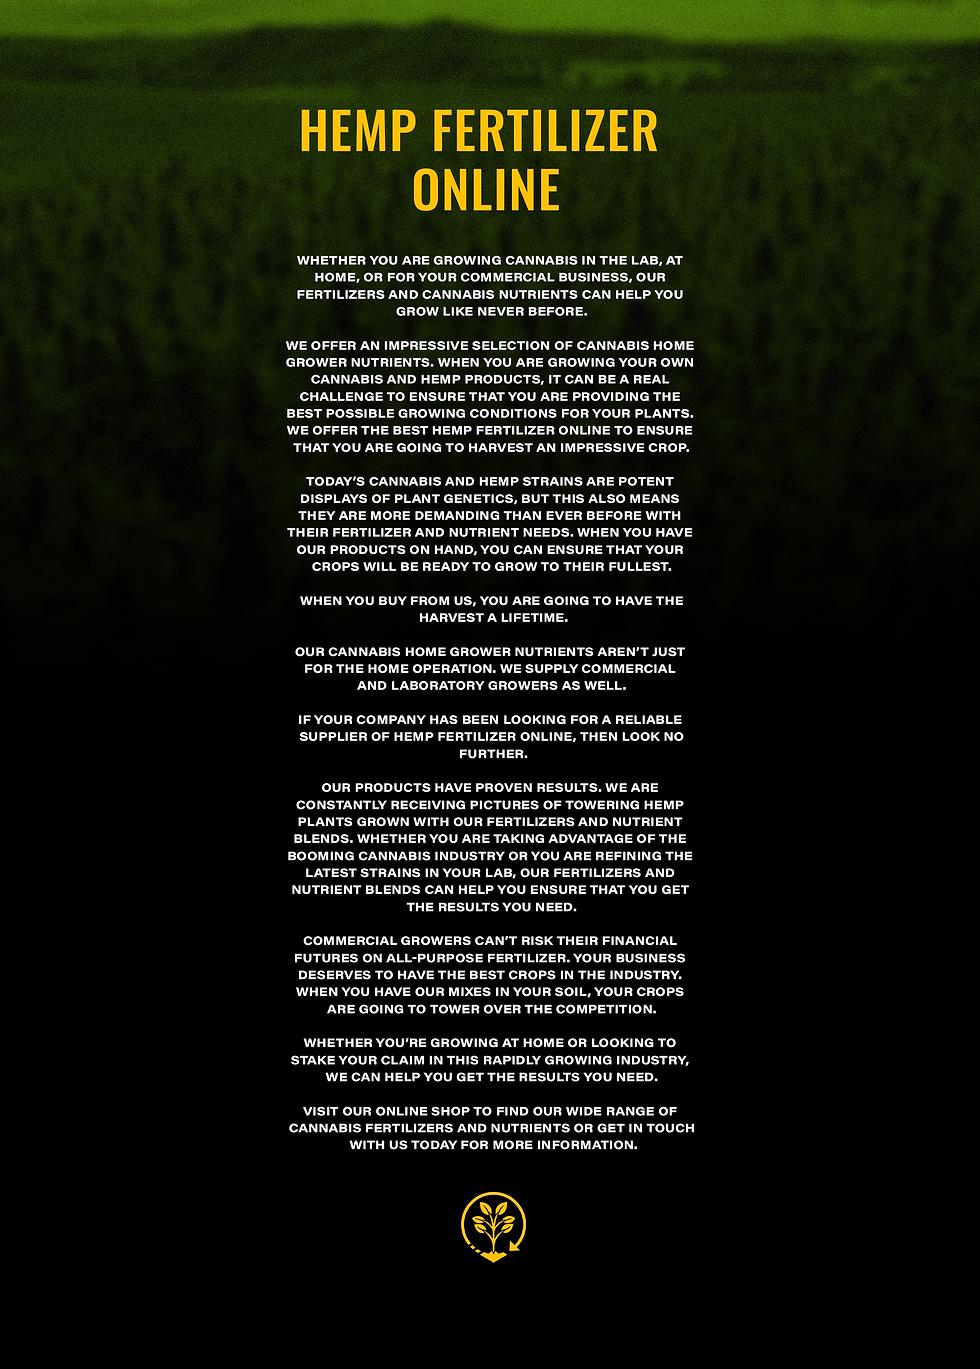 RKAG Hemp Fertilizer Online.png